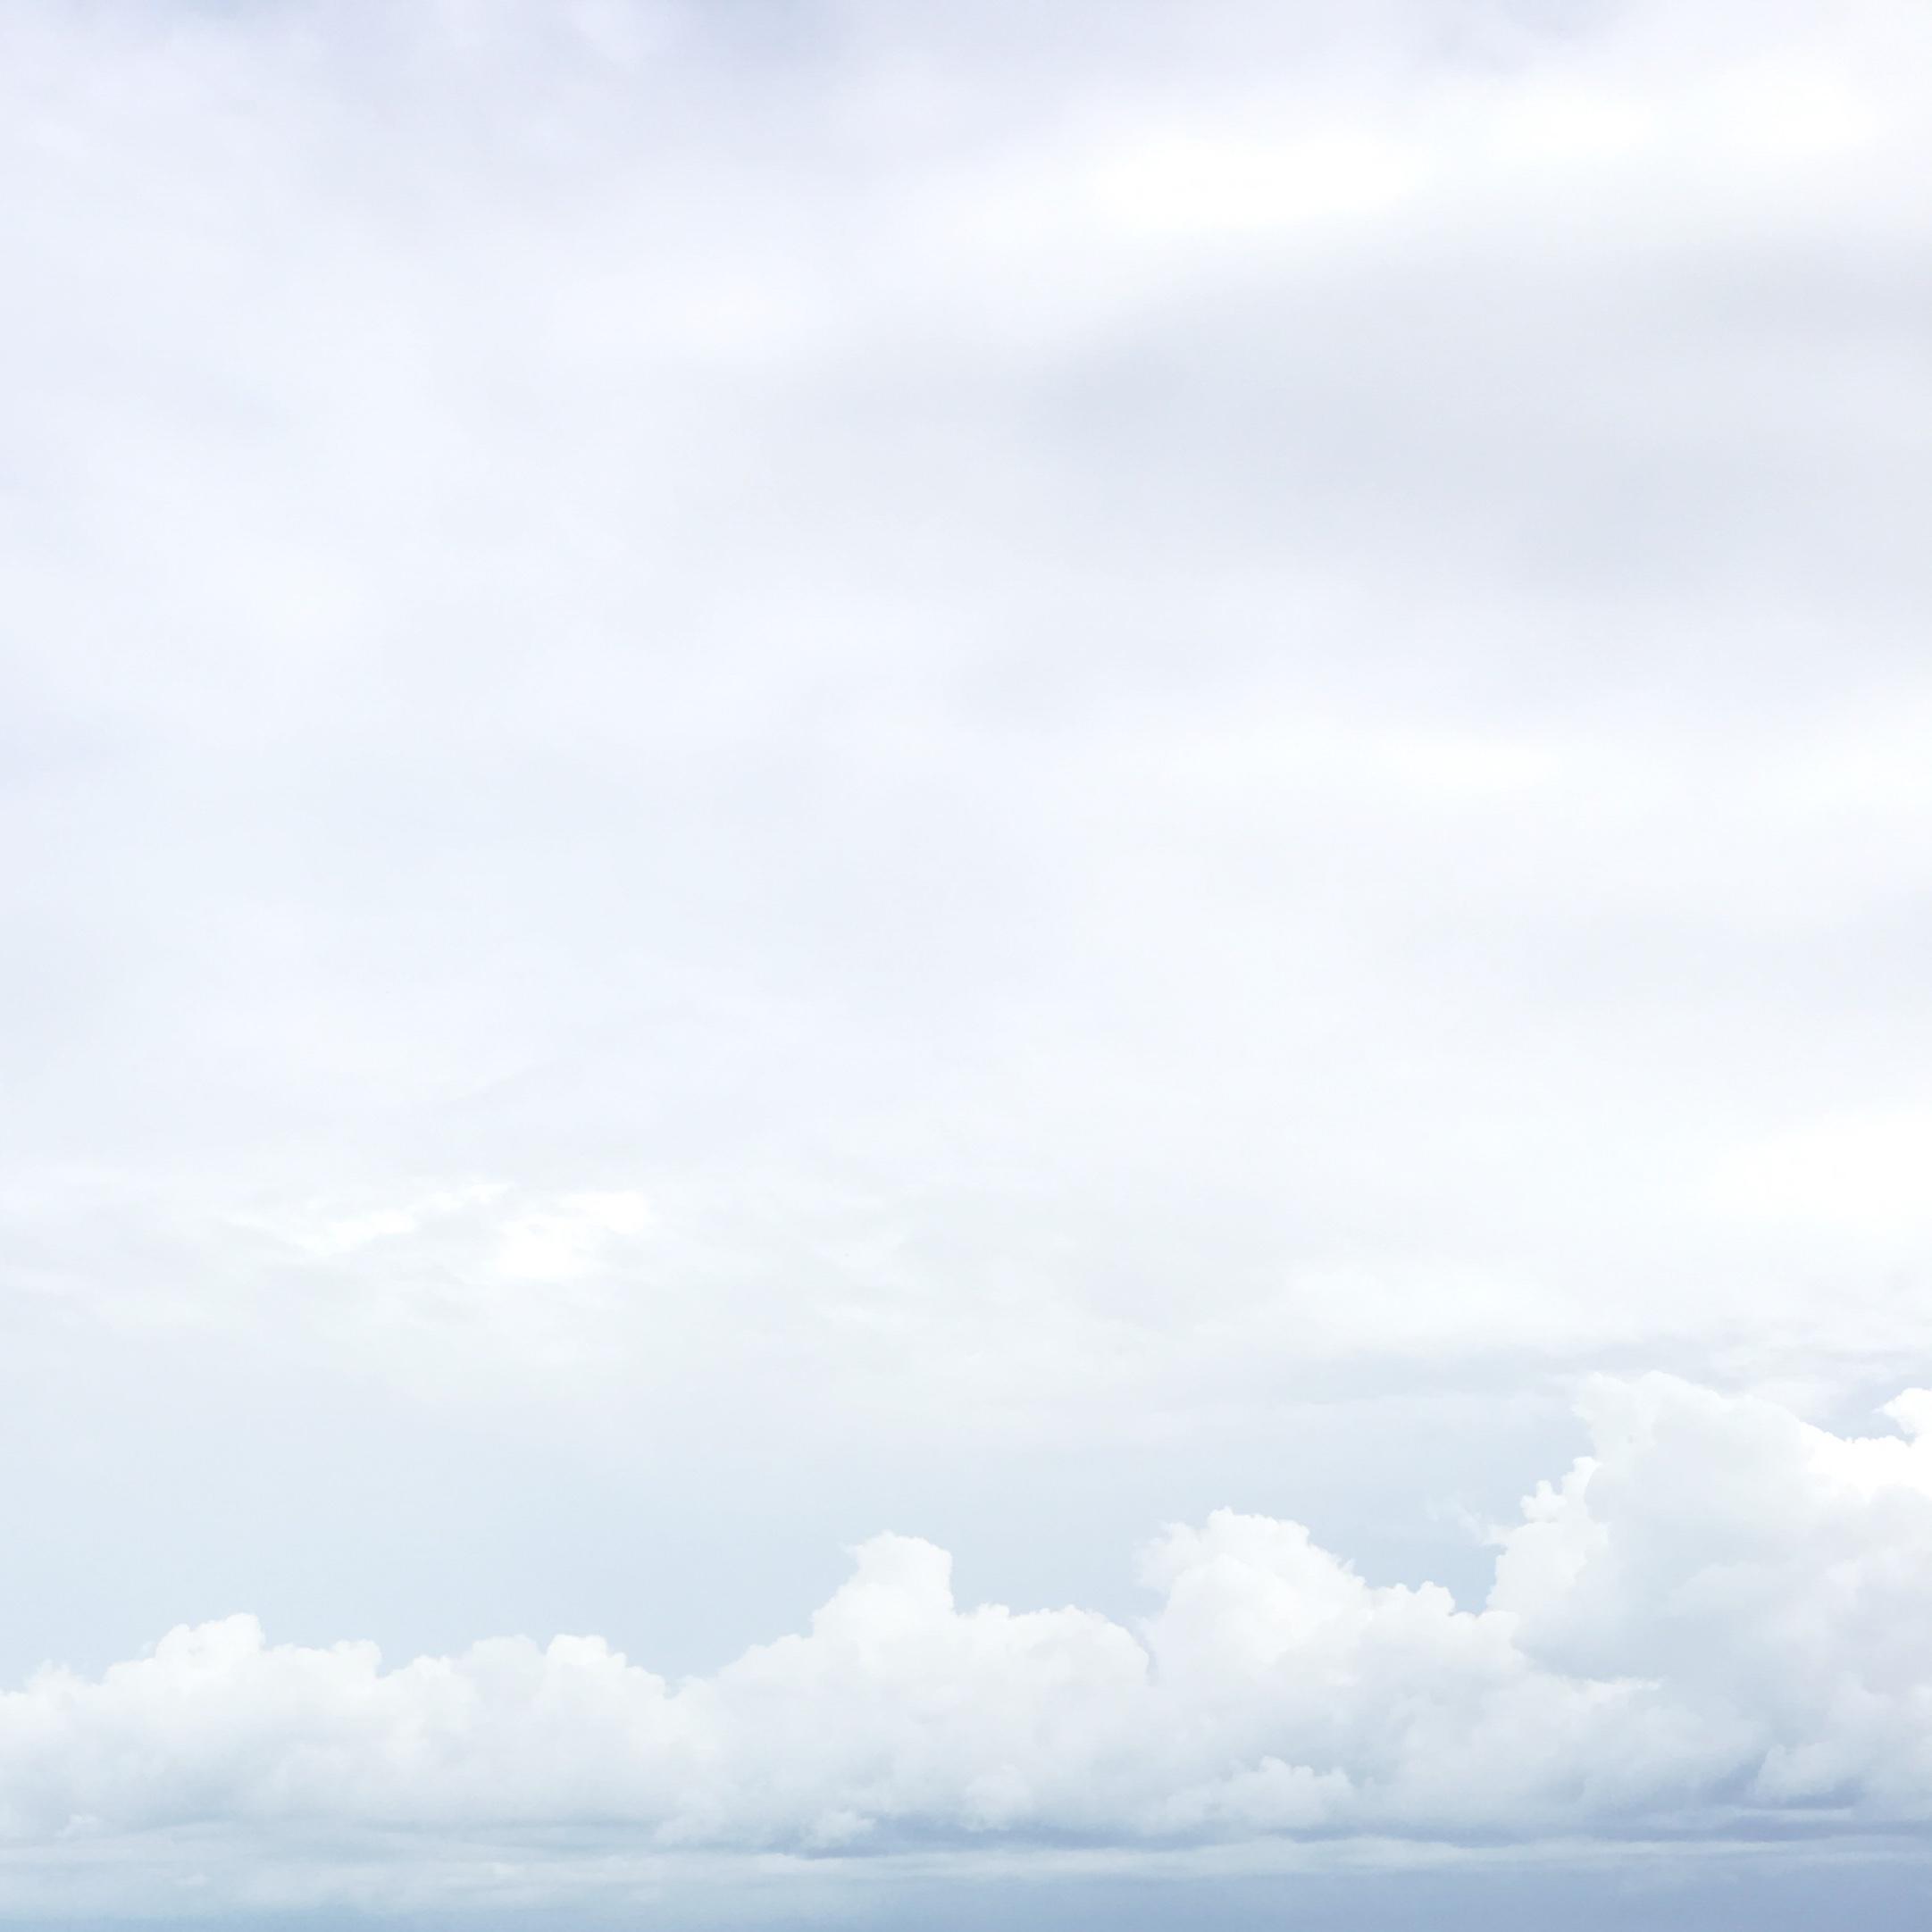 Stef_Etow_art_clouds.JPG